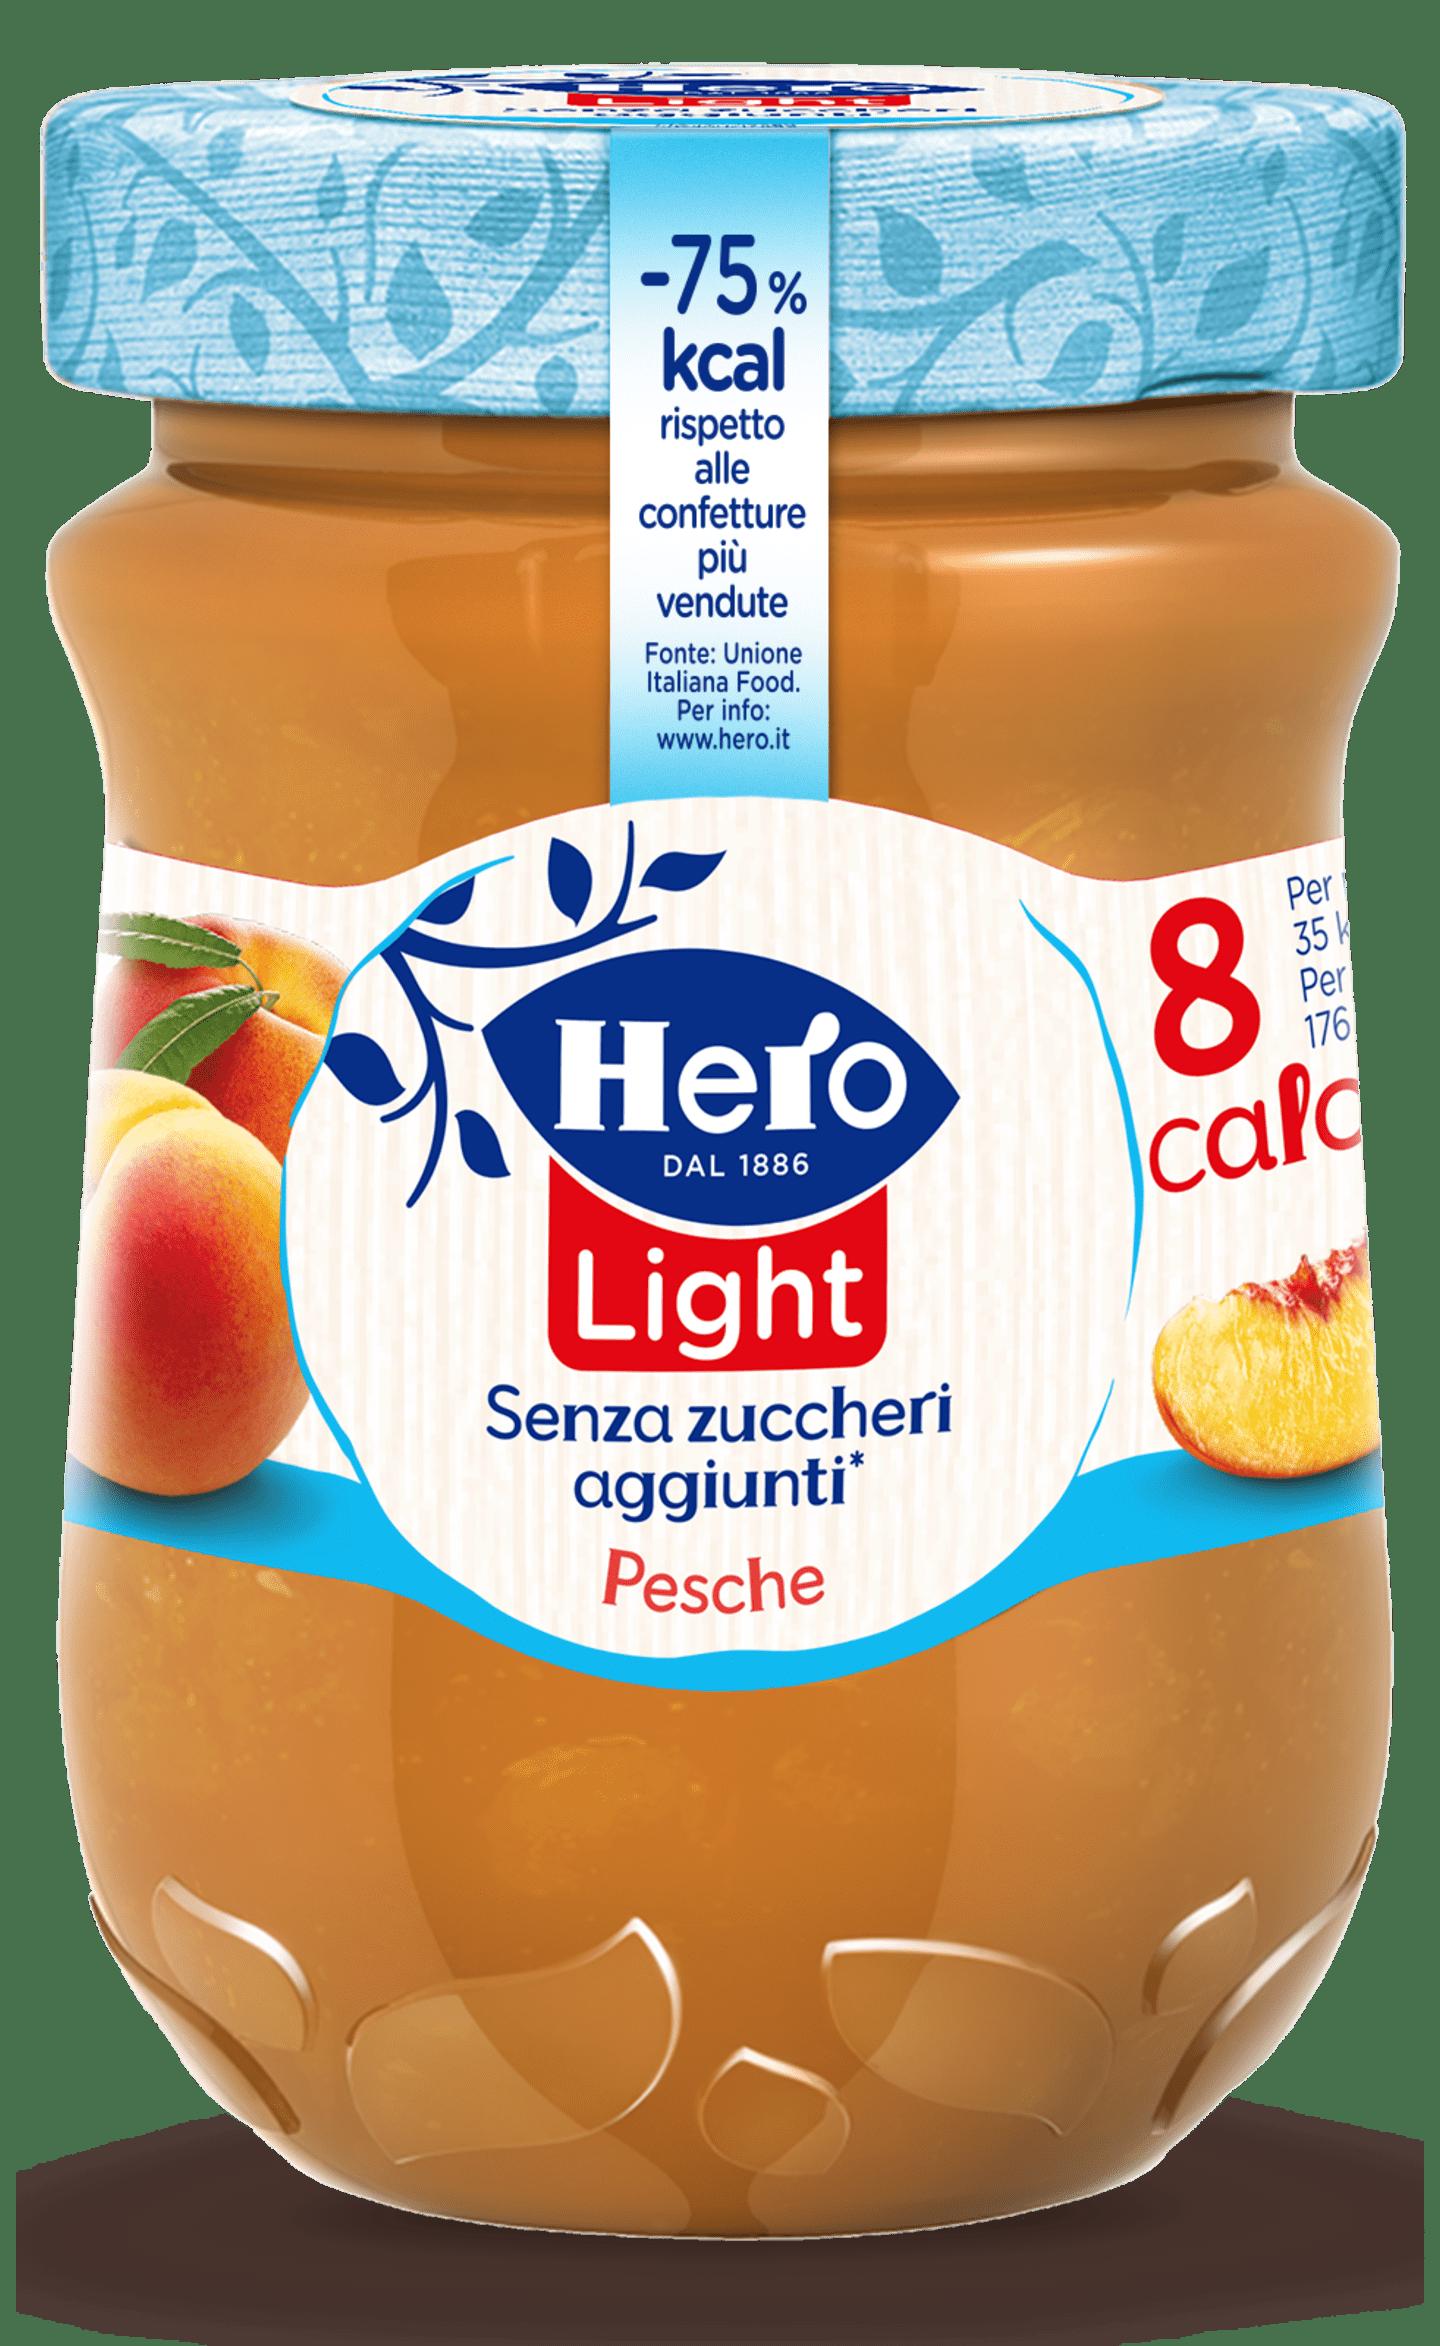 marmellata di pesche hero light